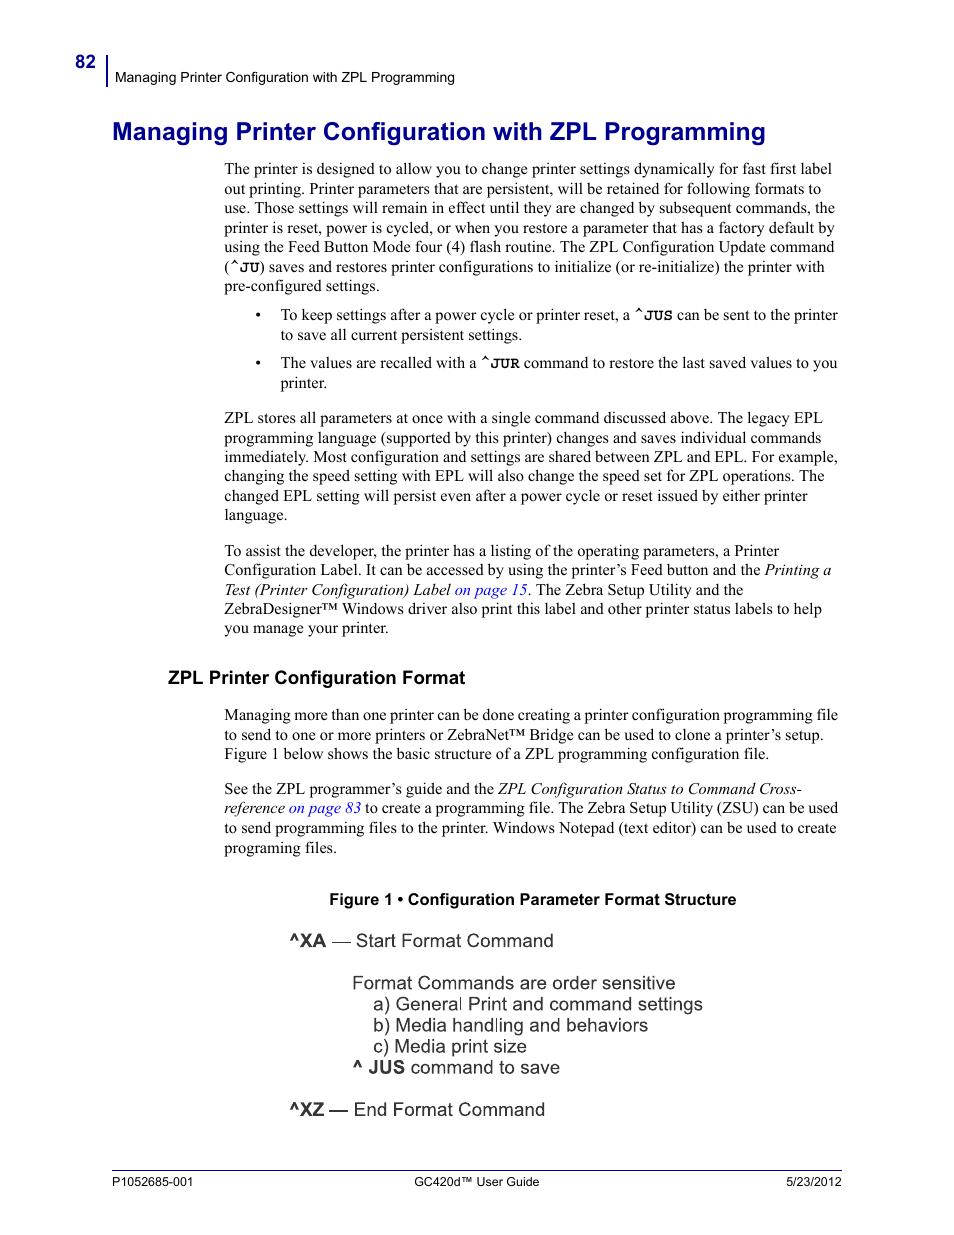 Zpl printer configuration format | Fairbanks Zebra GC420d